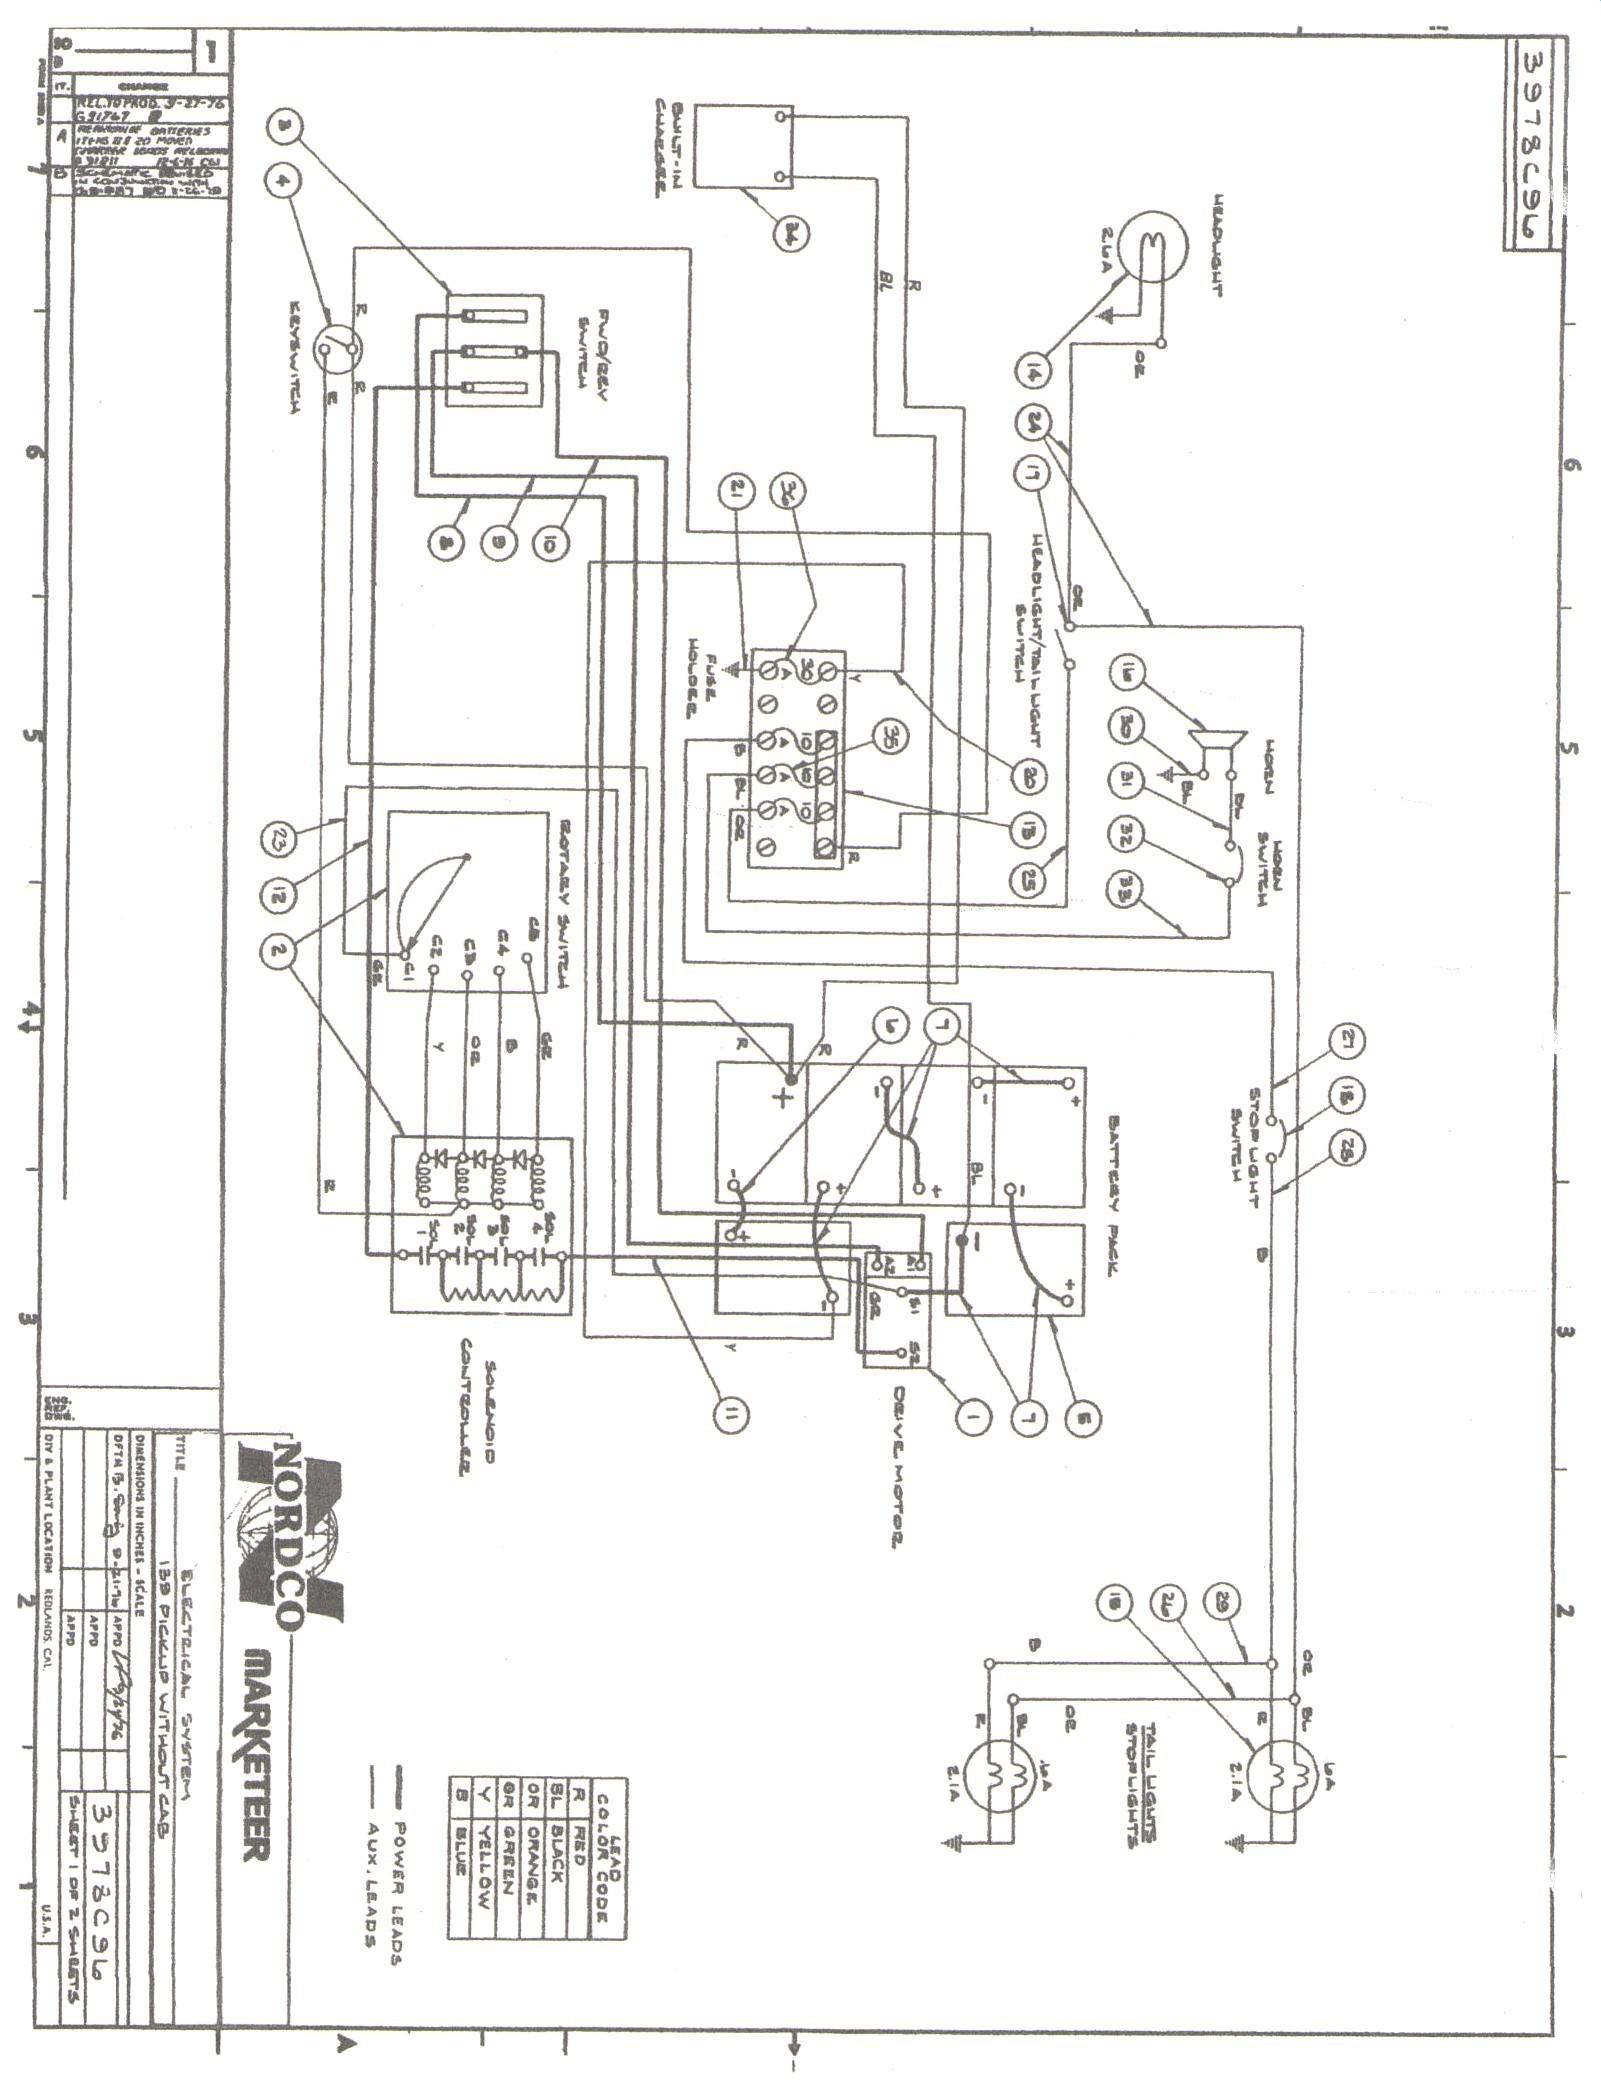 Ez Go Golf Cart Wiring Diagram Wiring Diagram for Ez Go Golf Cart Electric New Marketeer Golf Cart Of Ez Go Golf Cart Wiring Diagram